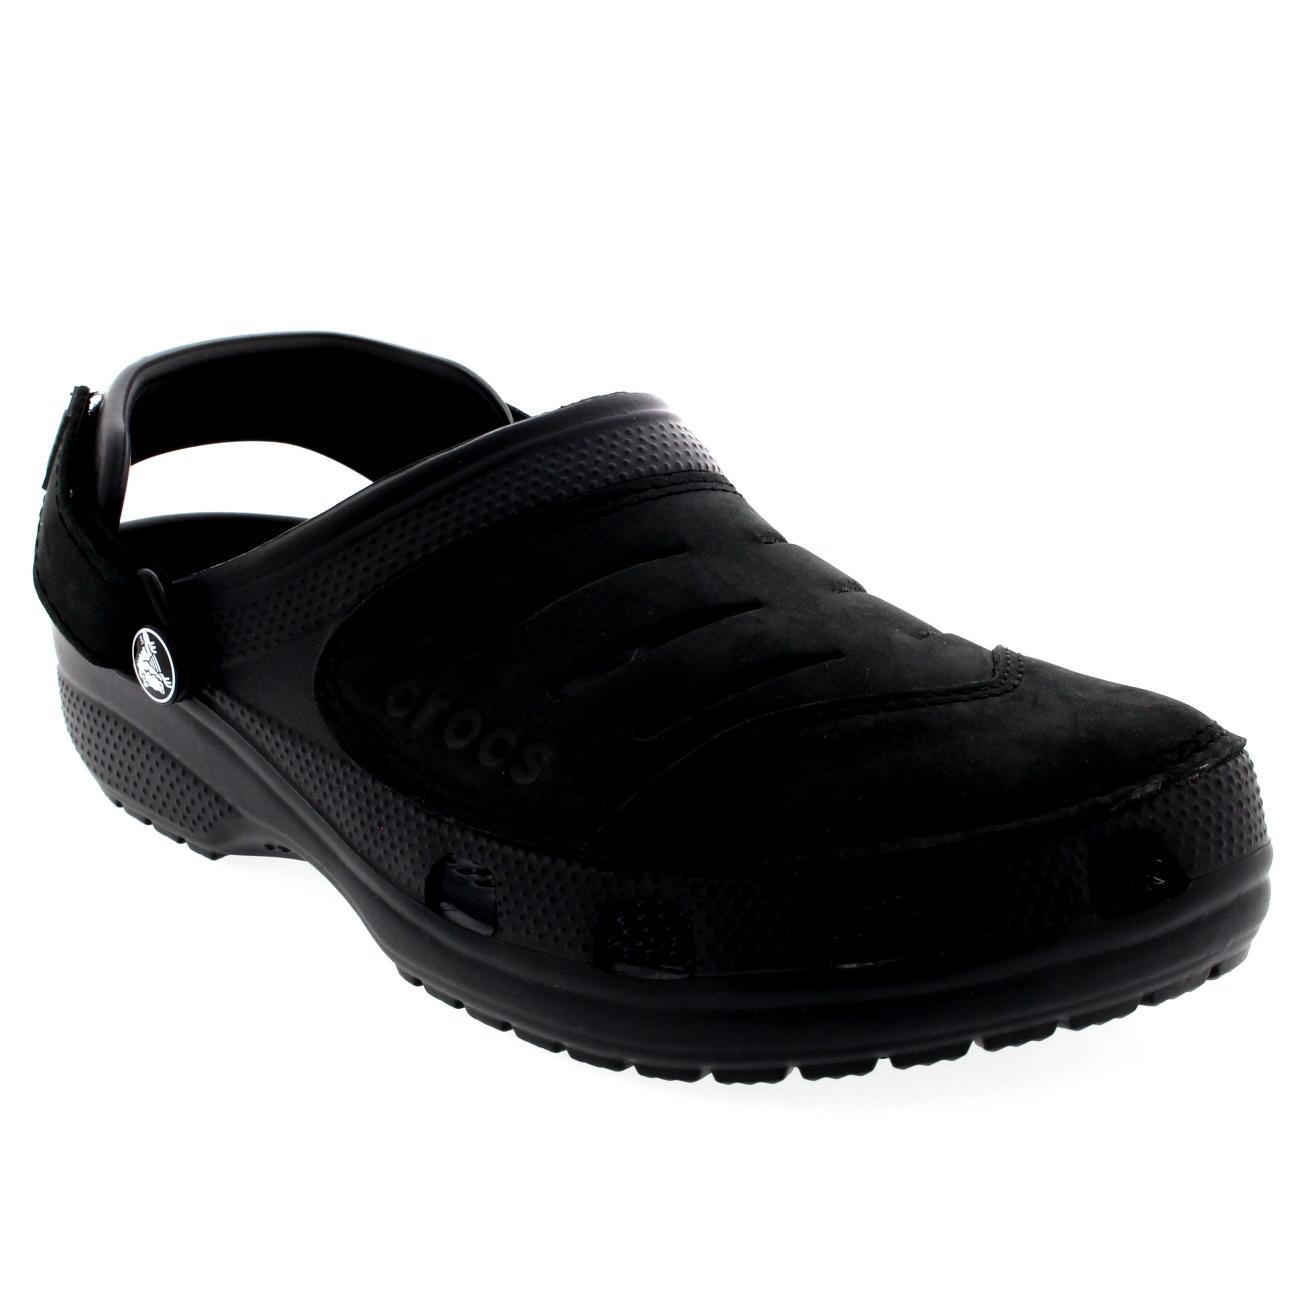 Mens Crocs Yukon Slip On Beach Lightweight Casual Clogs